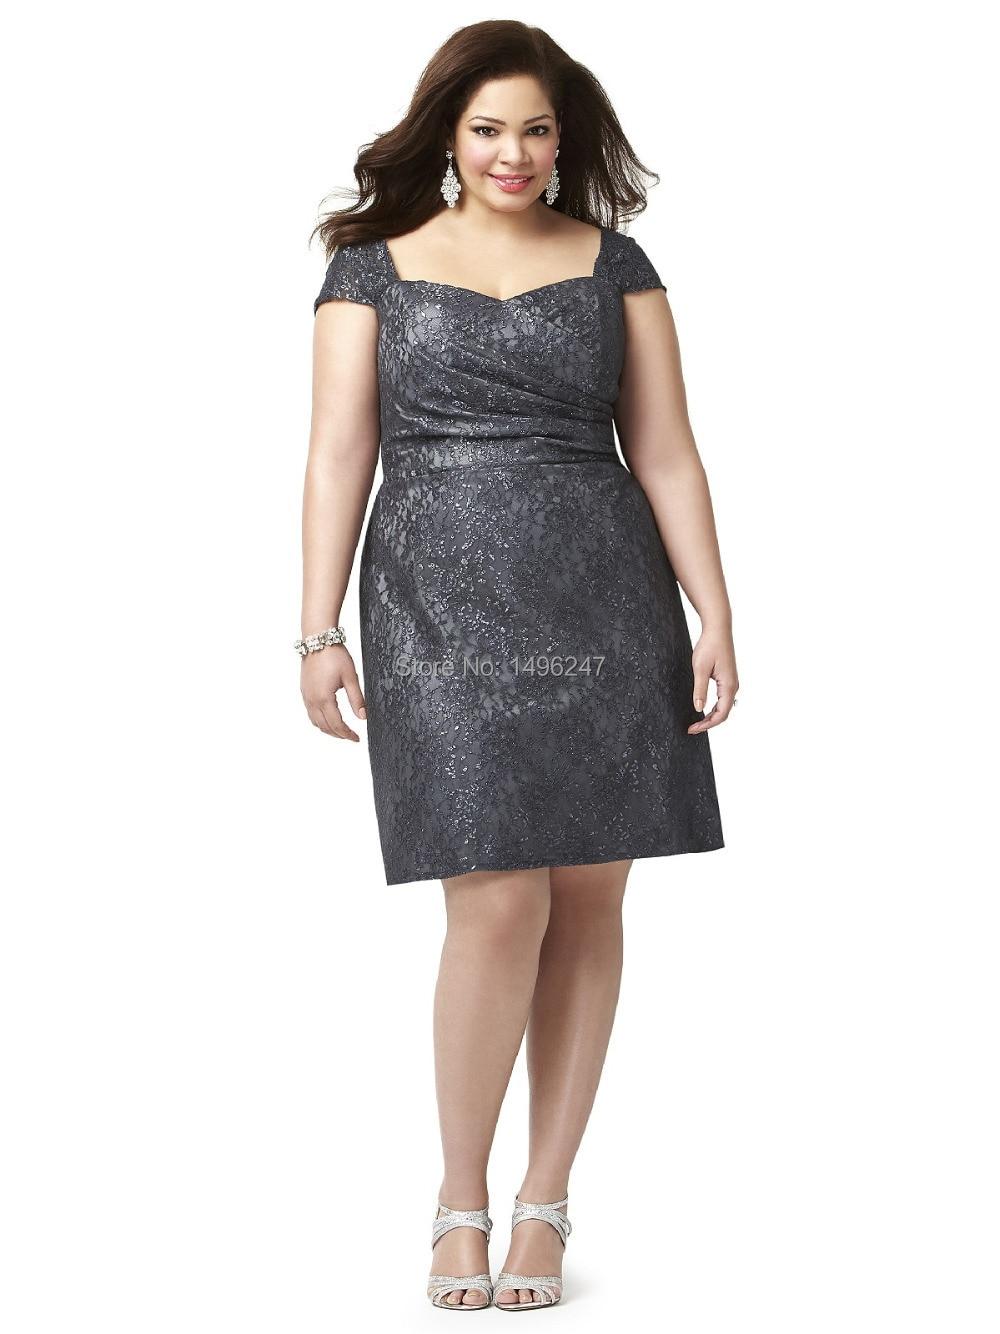 Plus Size Dresses Short Bridesmaid